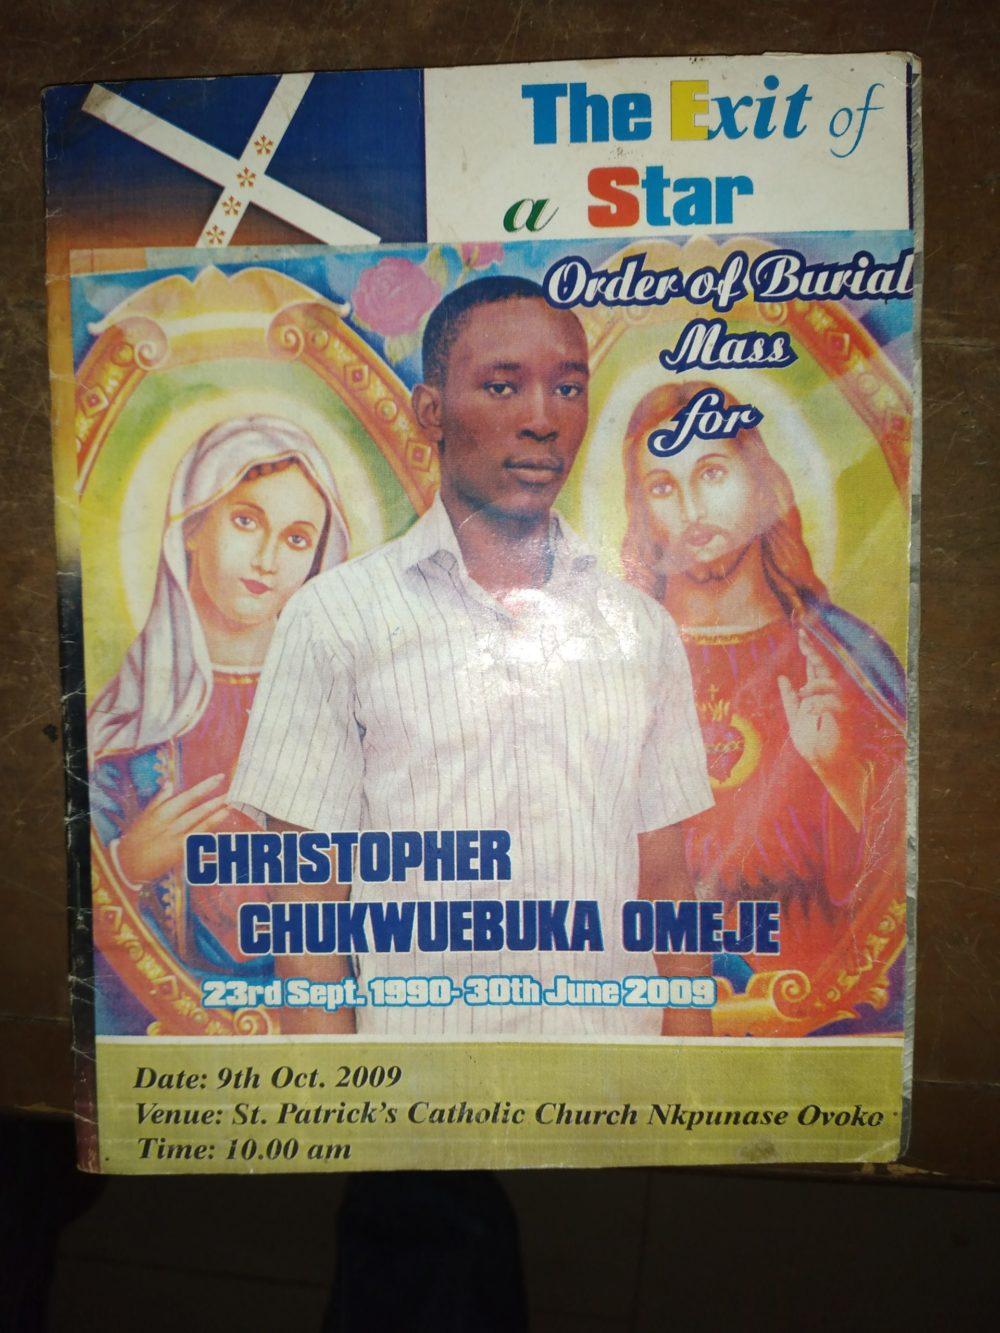 Picture of late Chukwuebuka Omeje